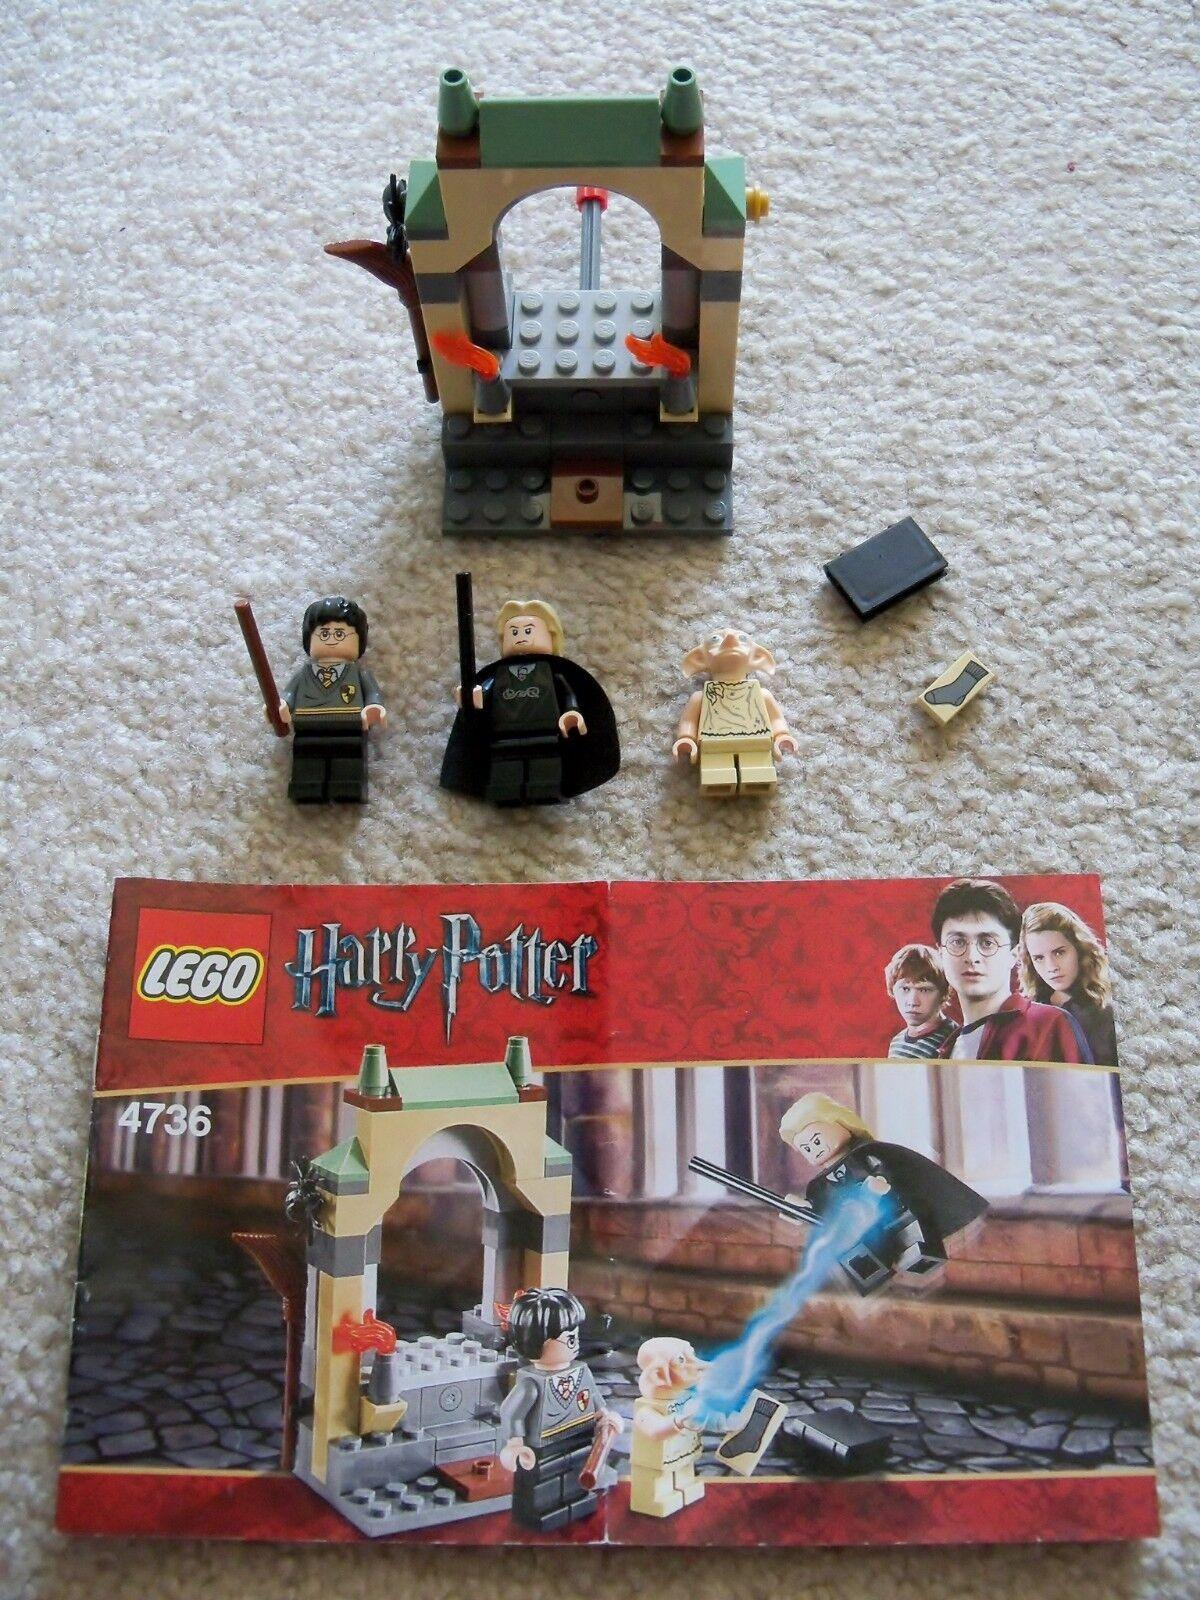 Lego Harry Potter - Selten - - Freeing Dobby 4736 - Selten Komplett mit   Anleitung cdbad0